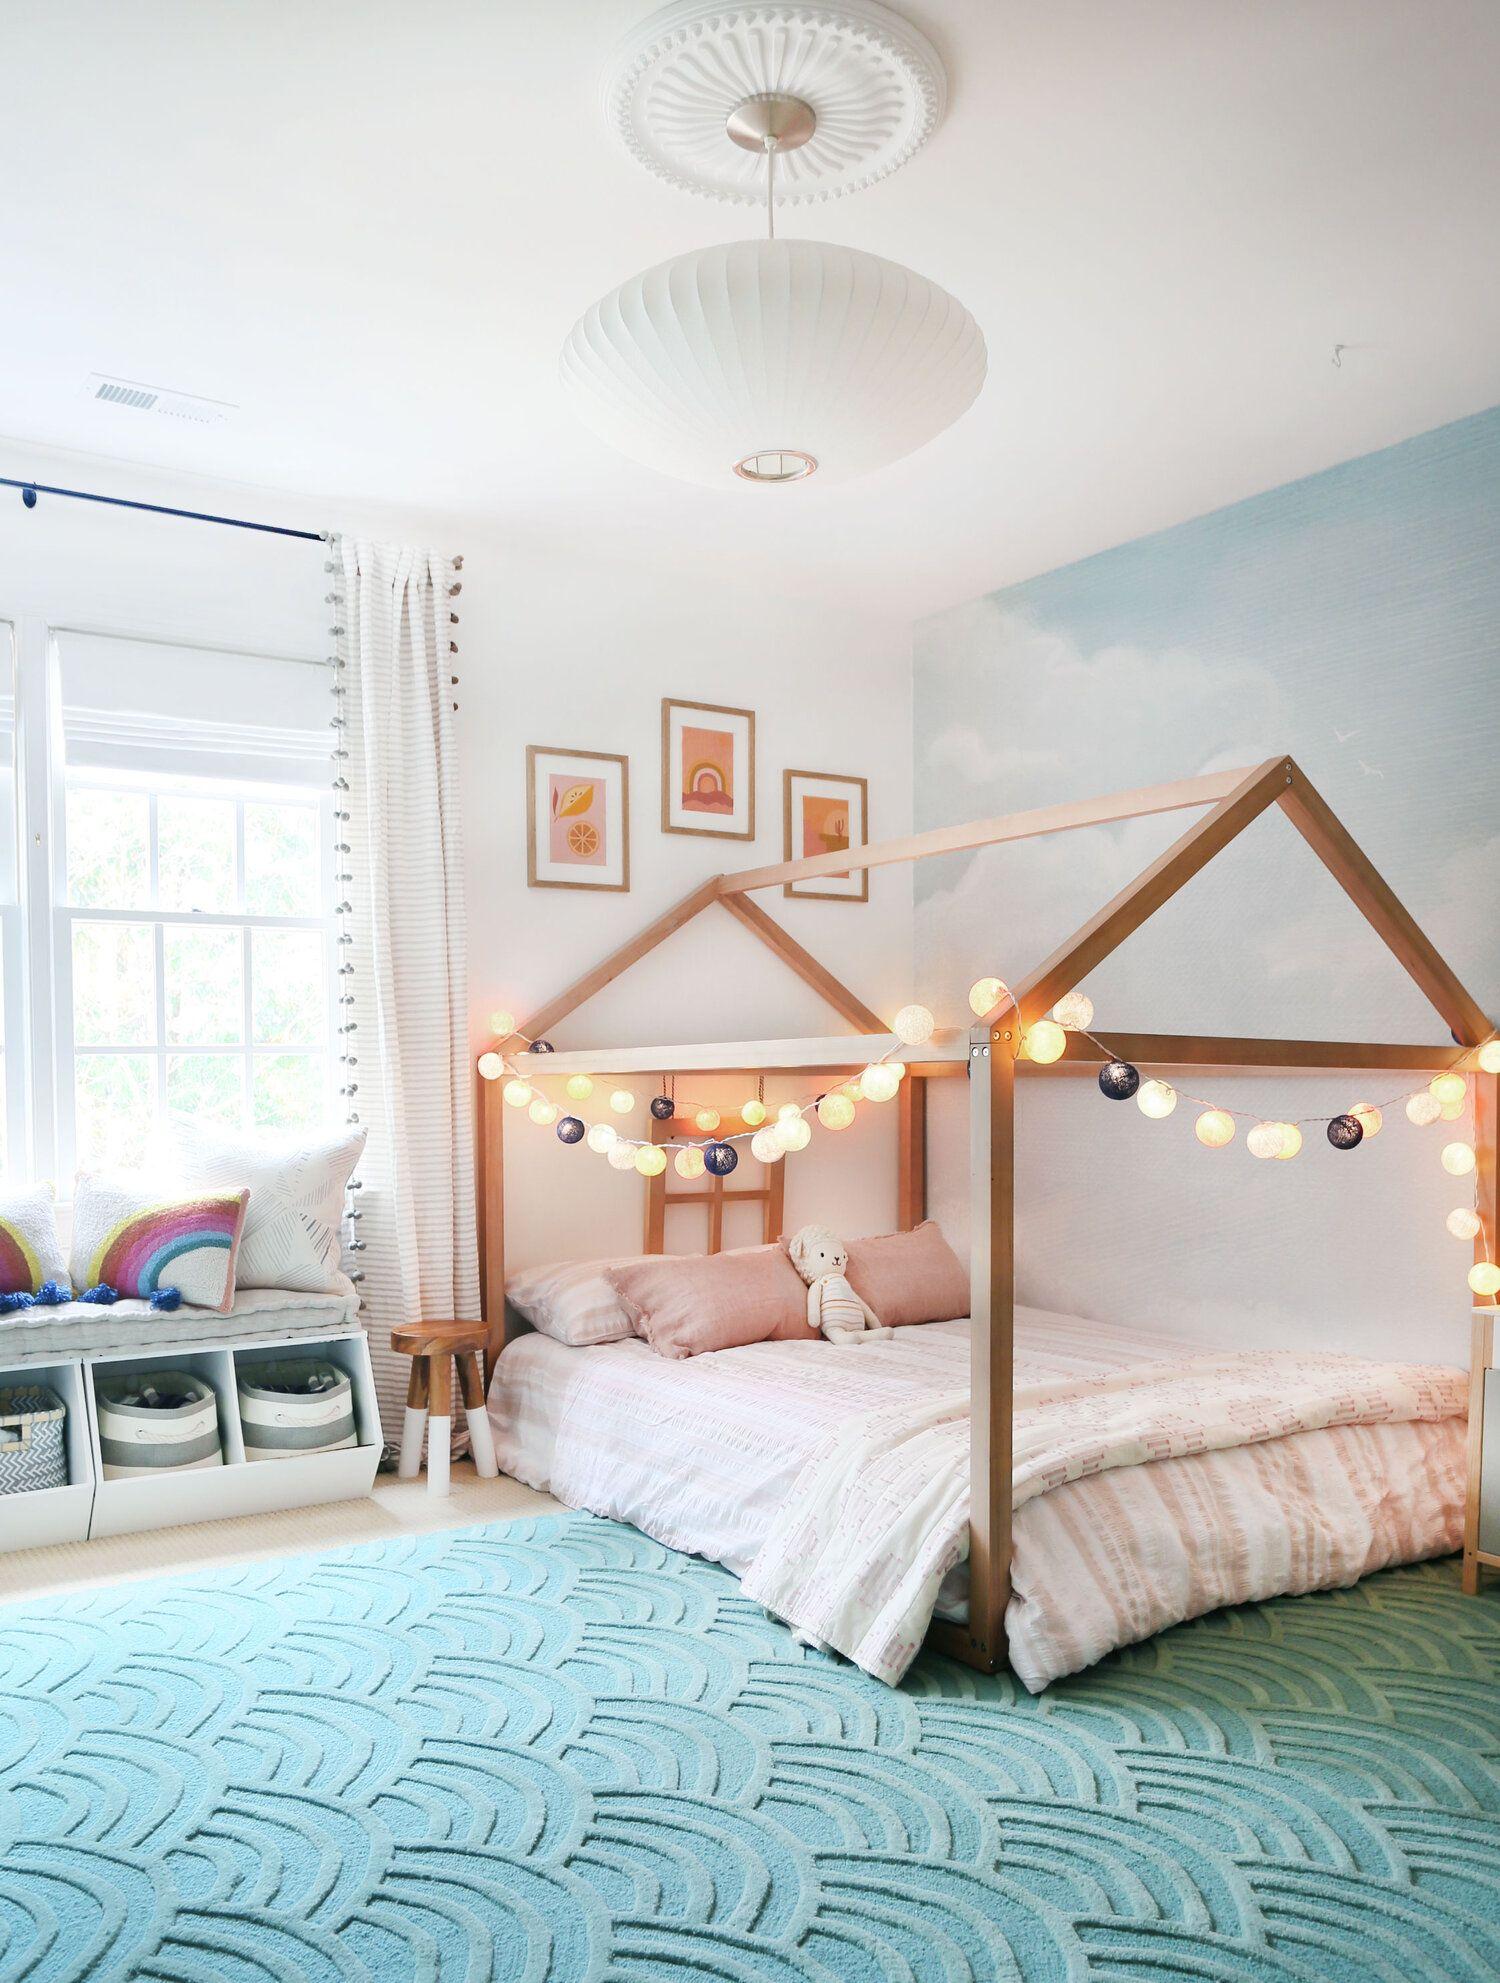 2019 Gift Guide For The Kiddos Kid Room Decor Room Big Girl Rooms